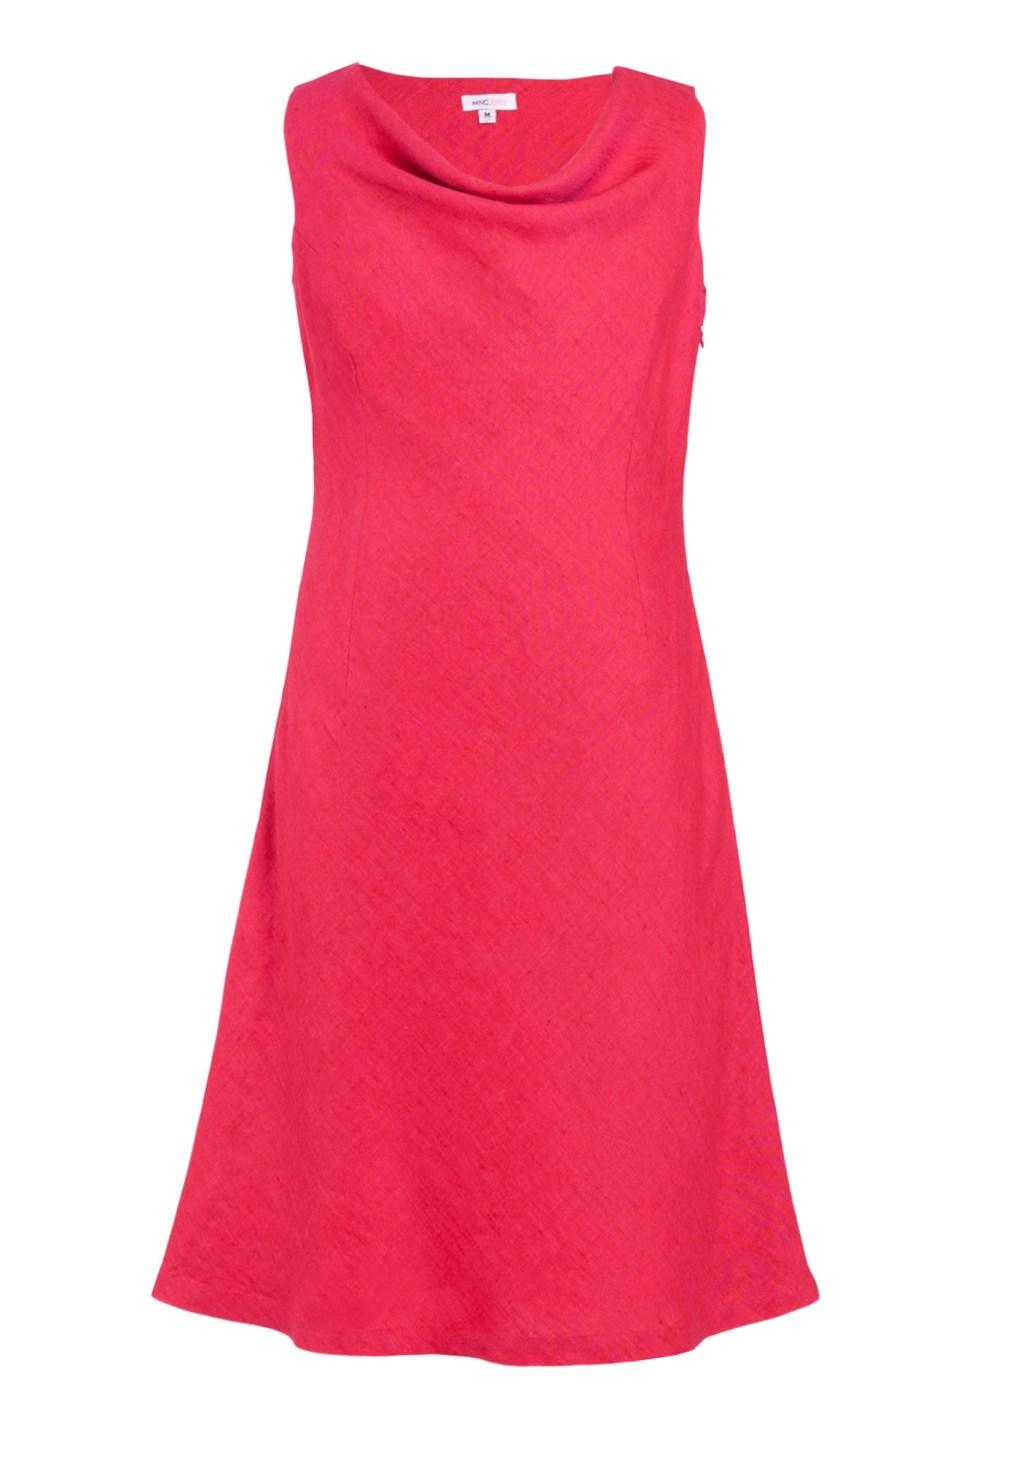 MINC Petite Raspberry Girls Cowl Neck Dress in Fuchsia Linen